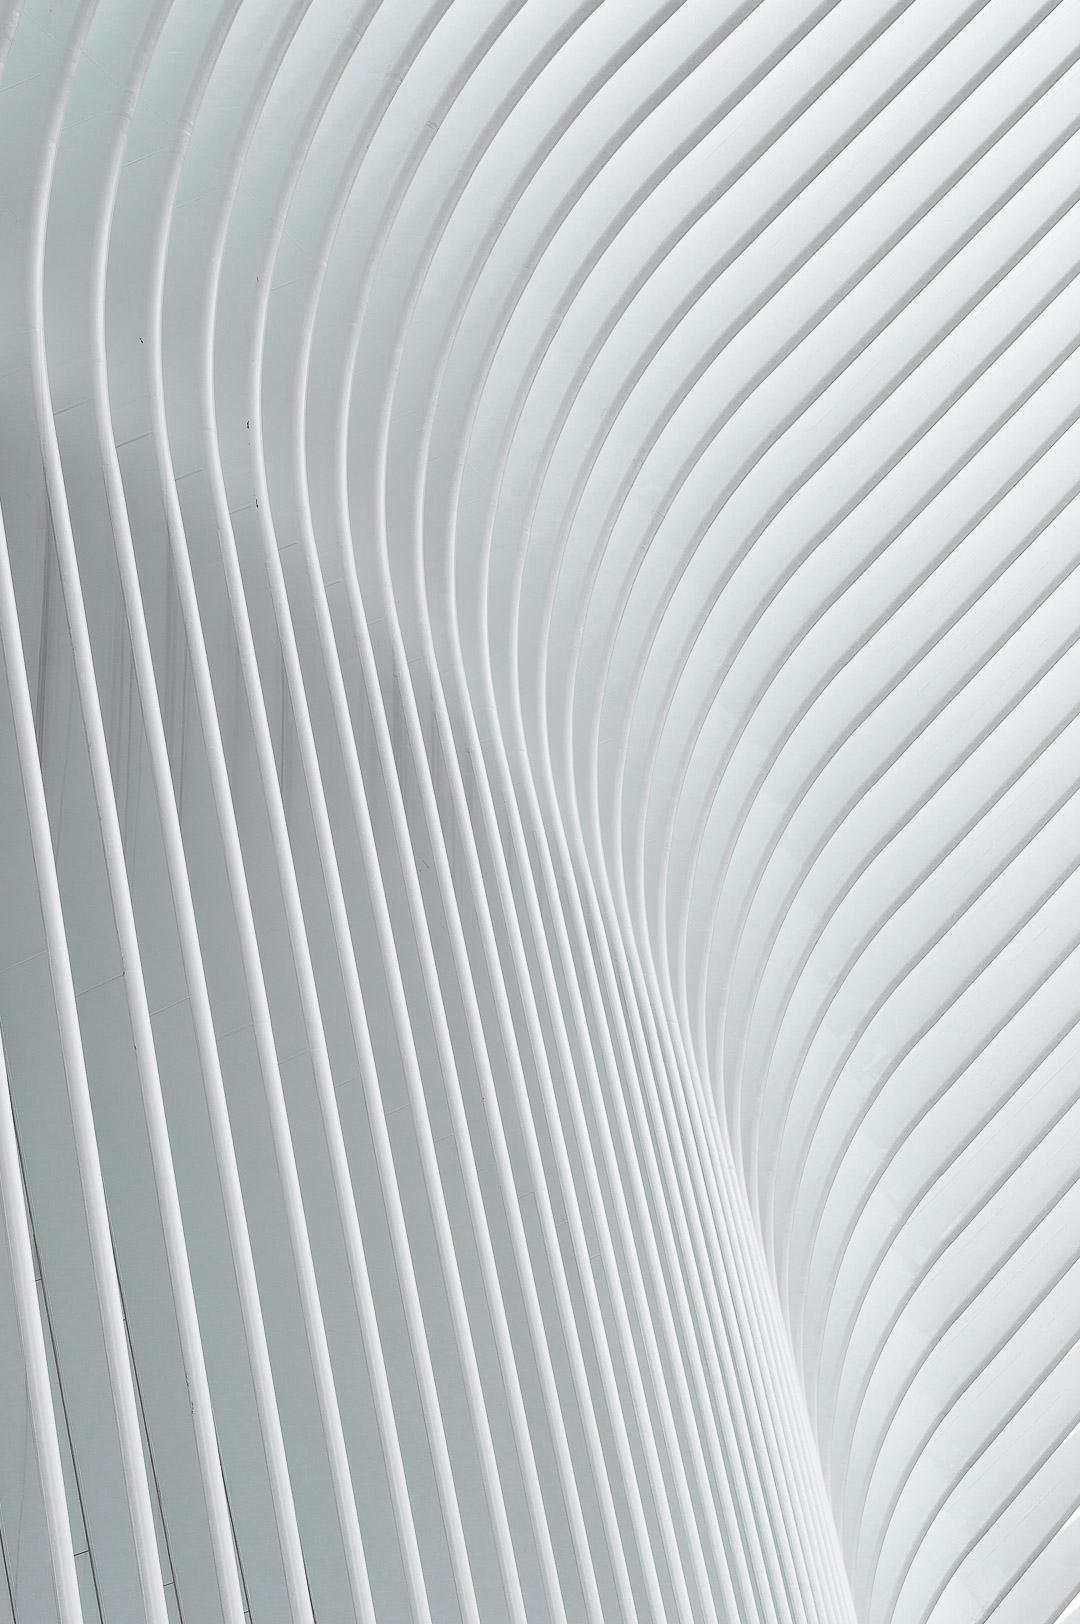 the oculus world trade center